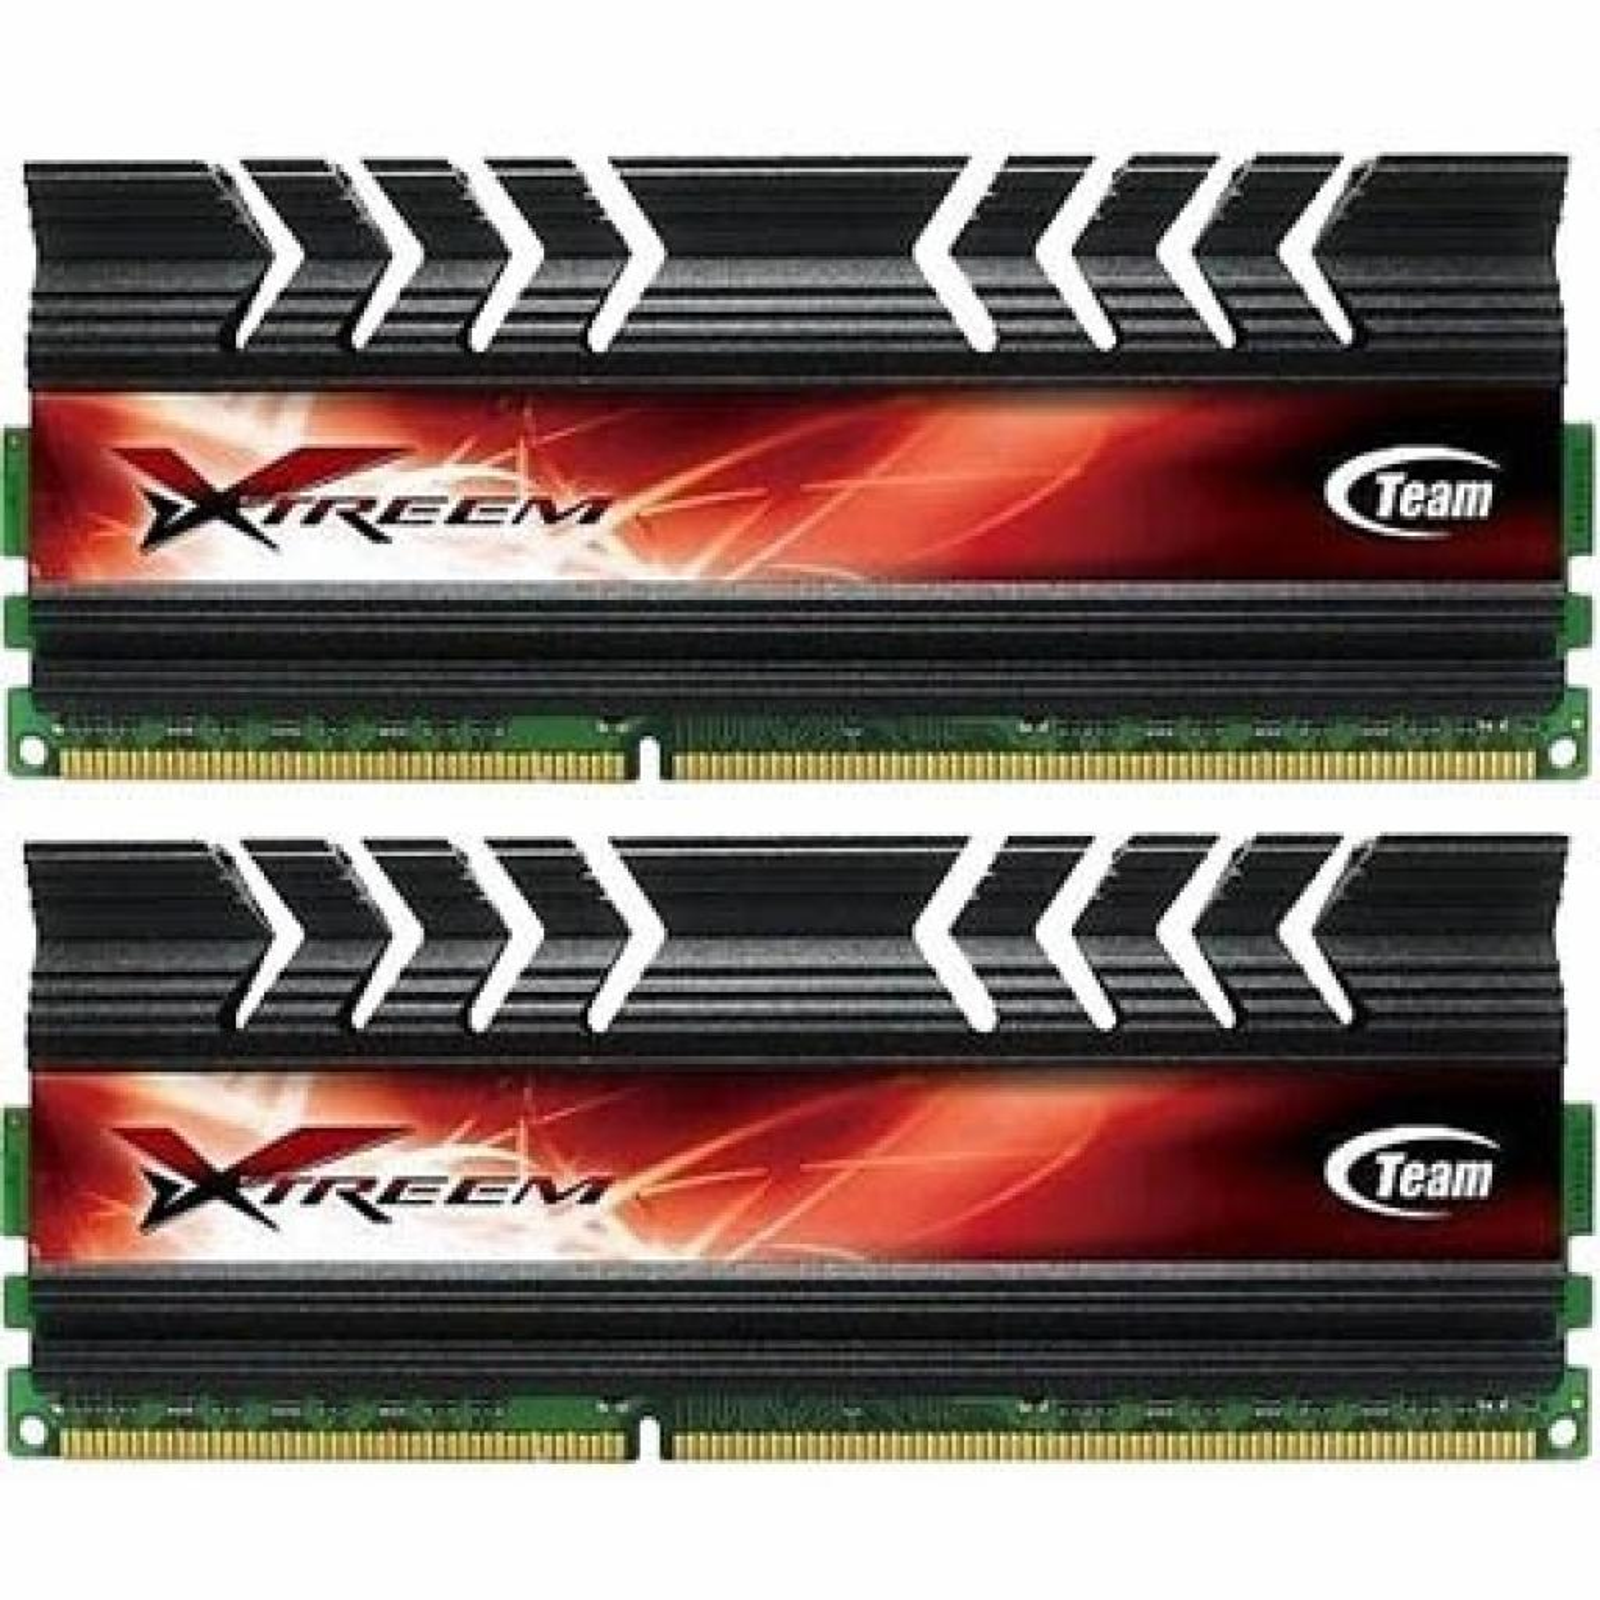 Модуль памяти для компьютера DDR3 8GB (2x4GB) 2666 MHz Team (TXD38G2666HC11CDC01)